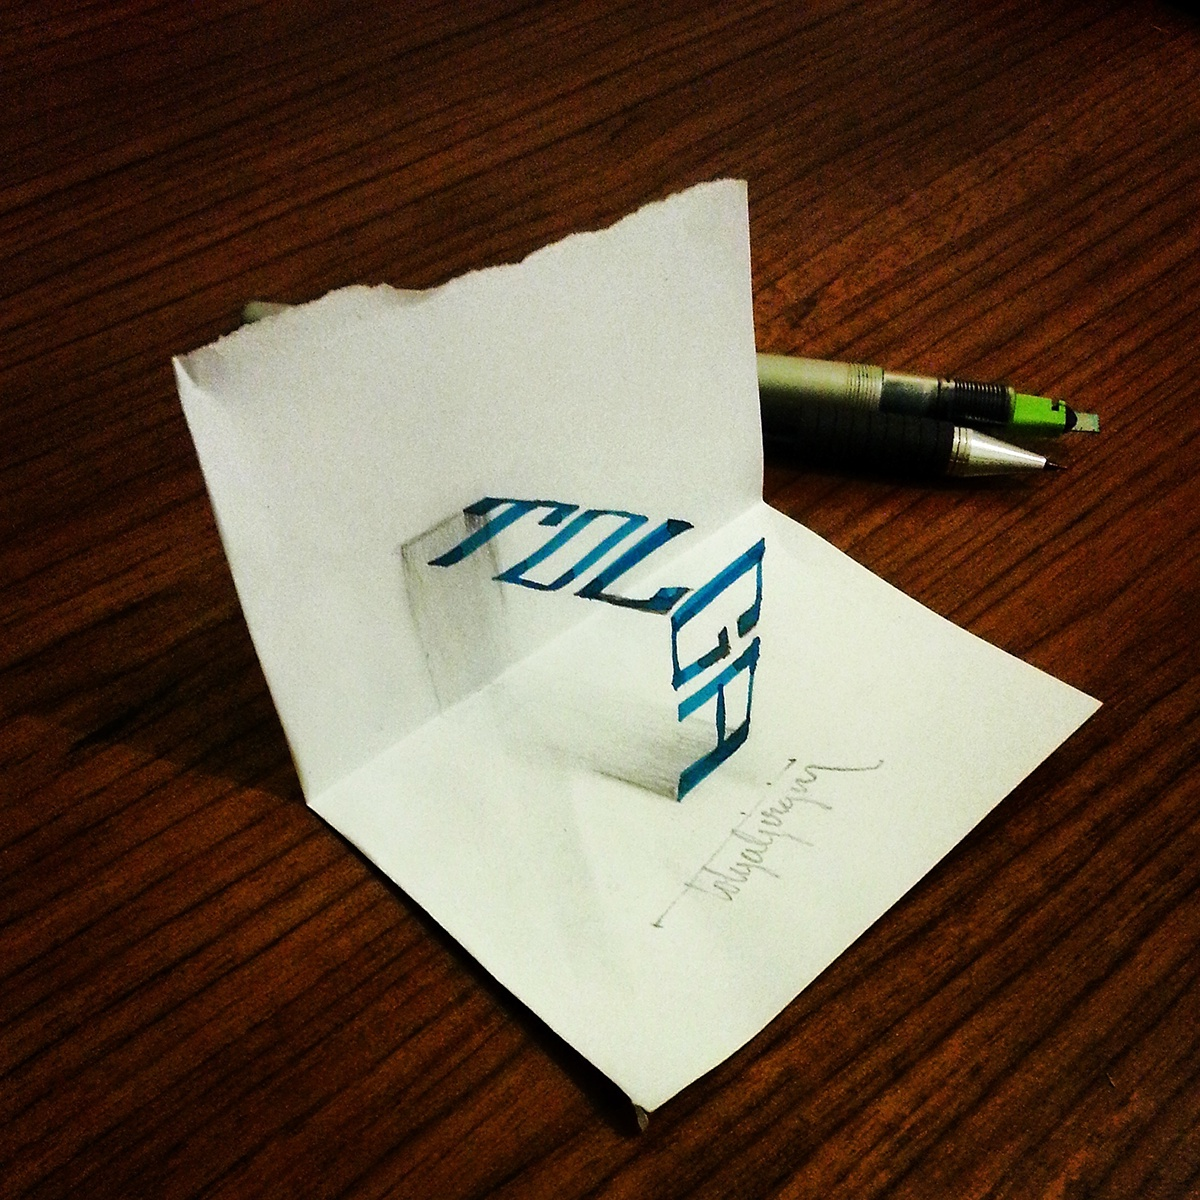 3D Calligraphy, by Tolga Girgin